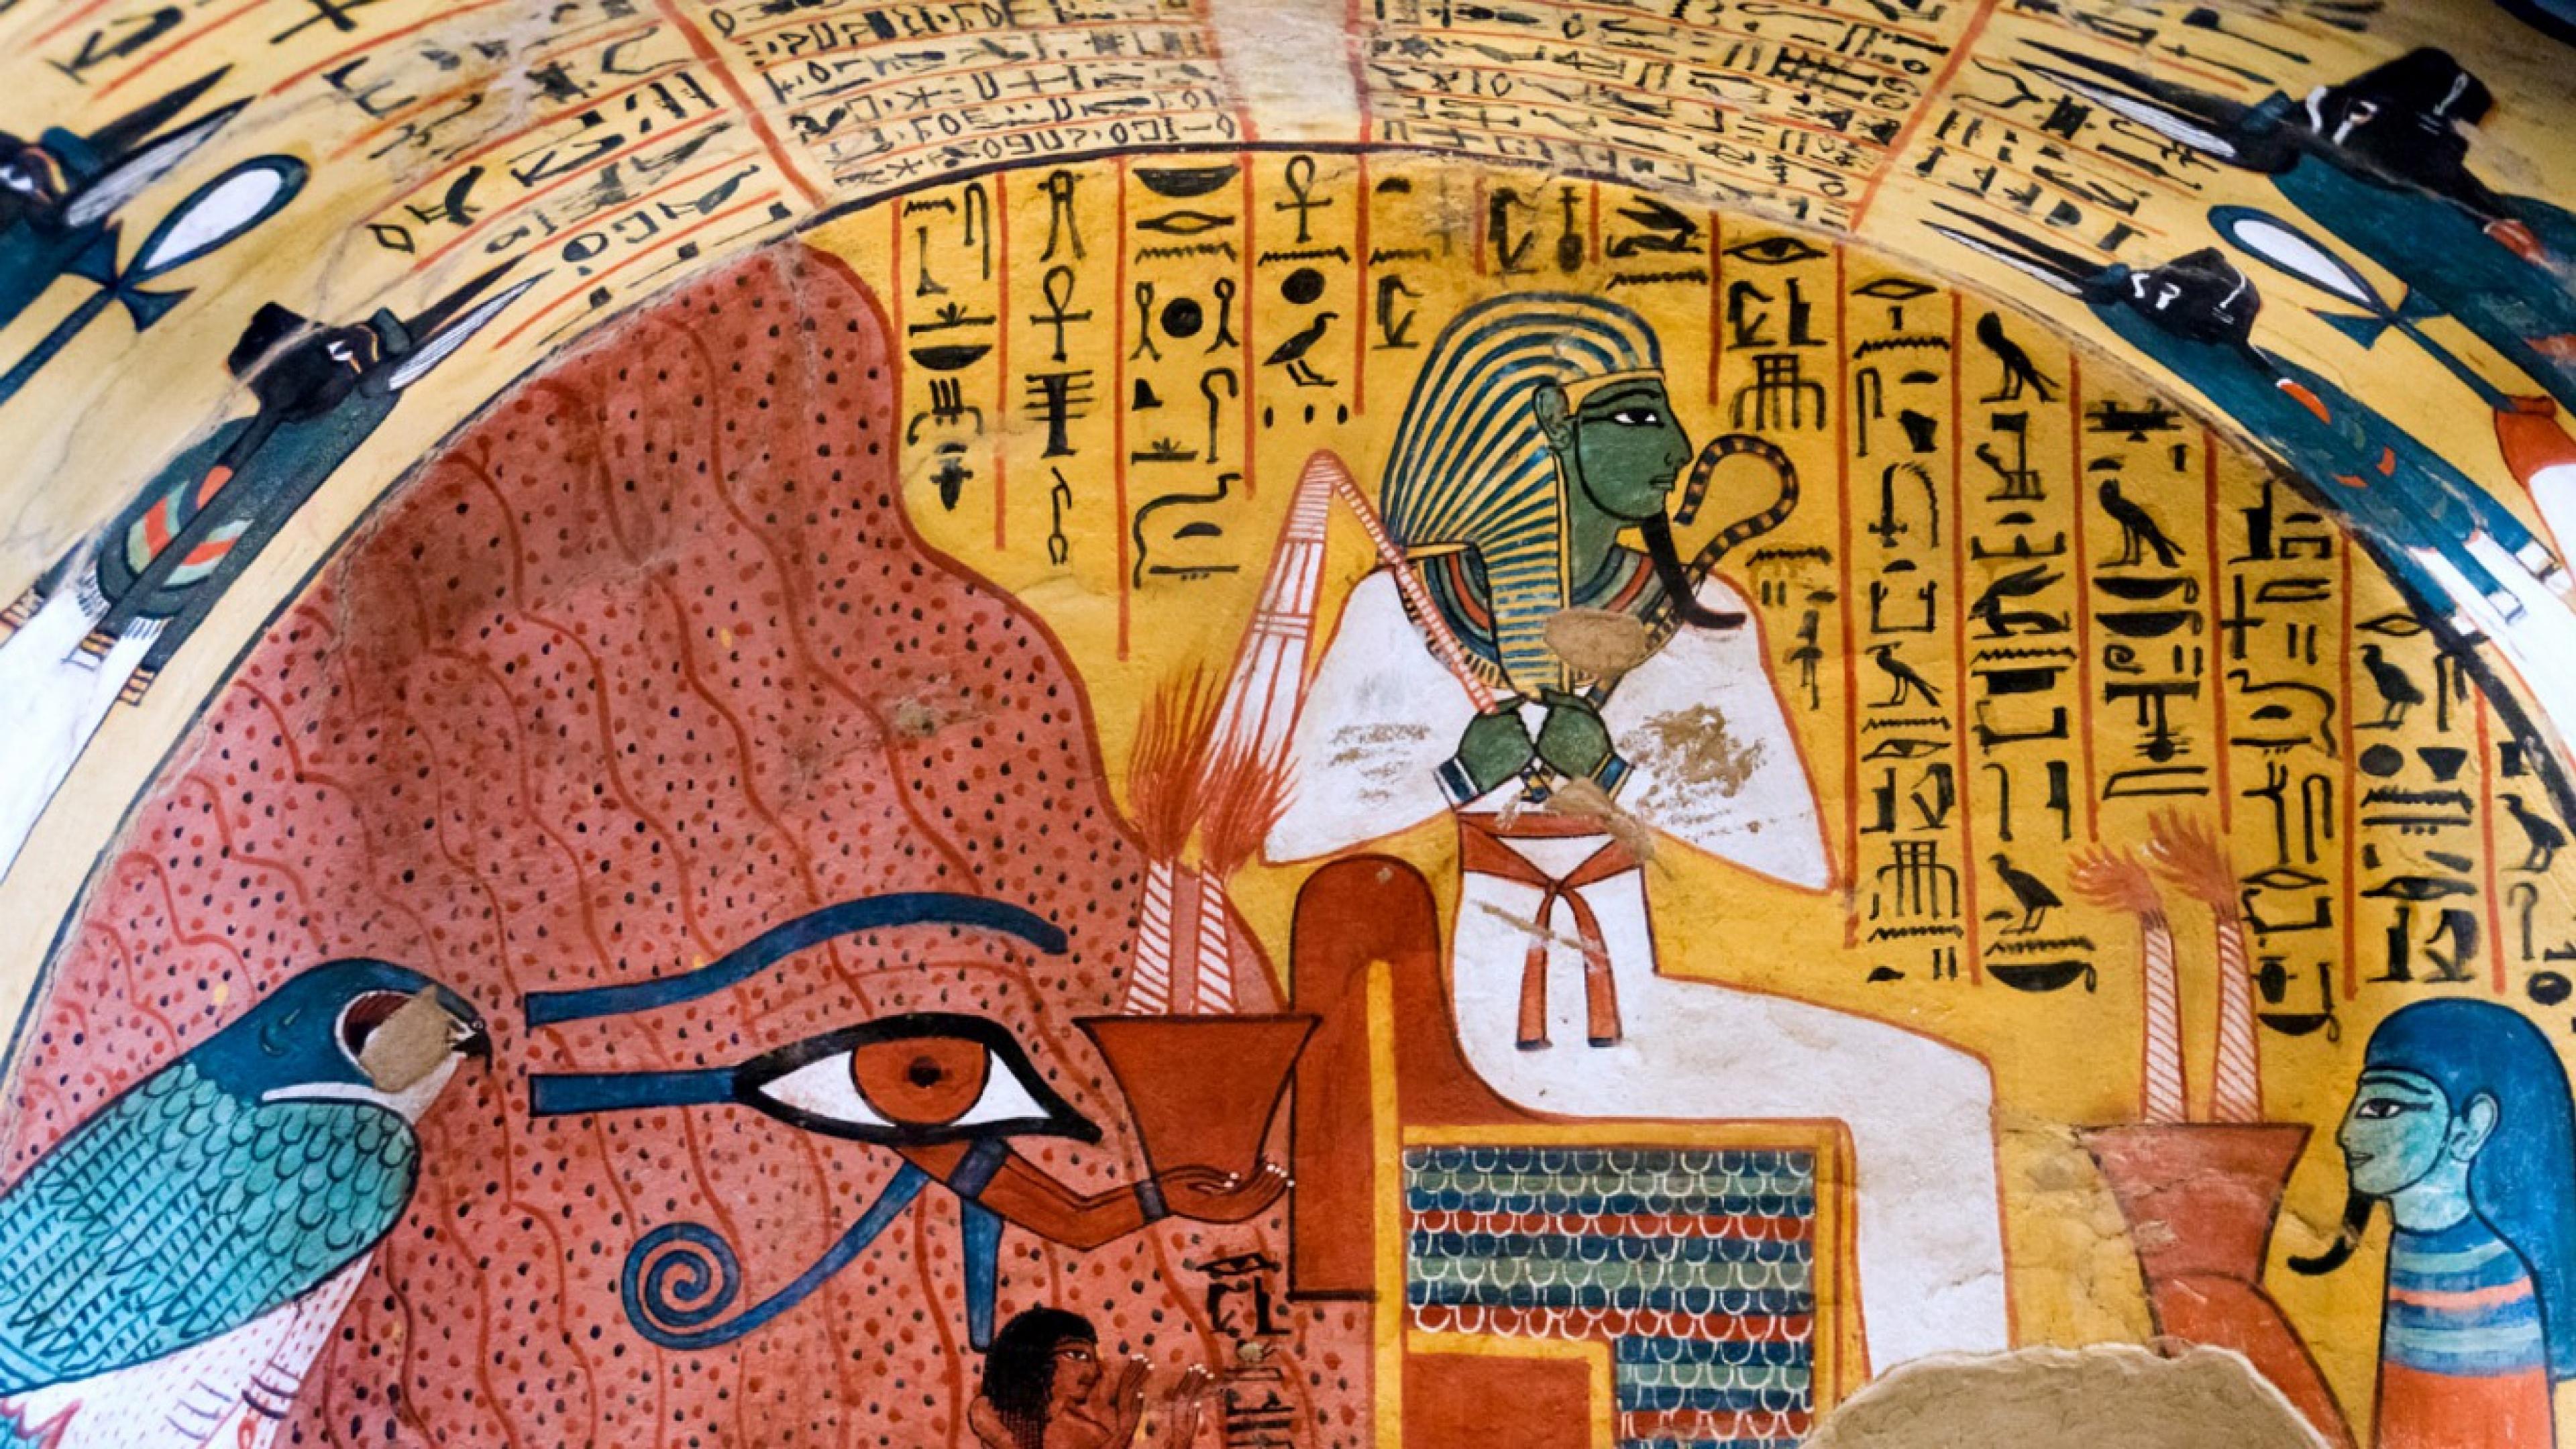 wall_painting_art_egypt_hieroglyphics_tomb_ultra_3840x2160_hd-wallpaper-1798162